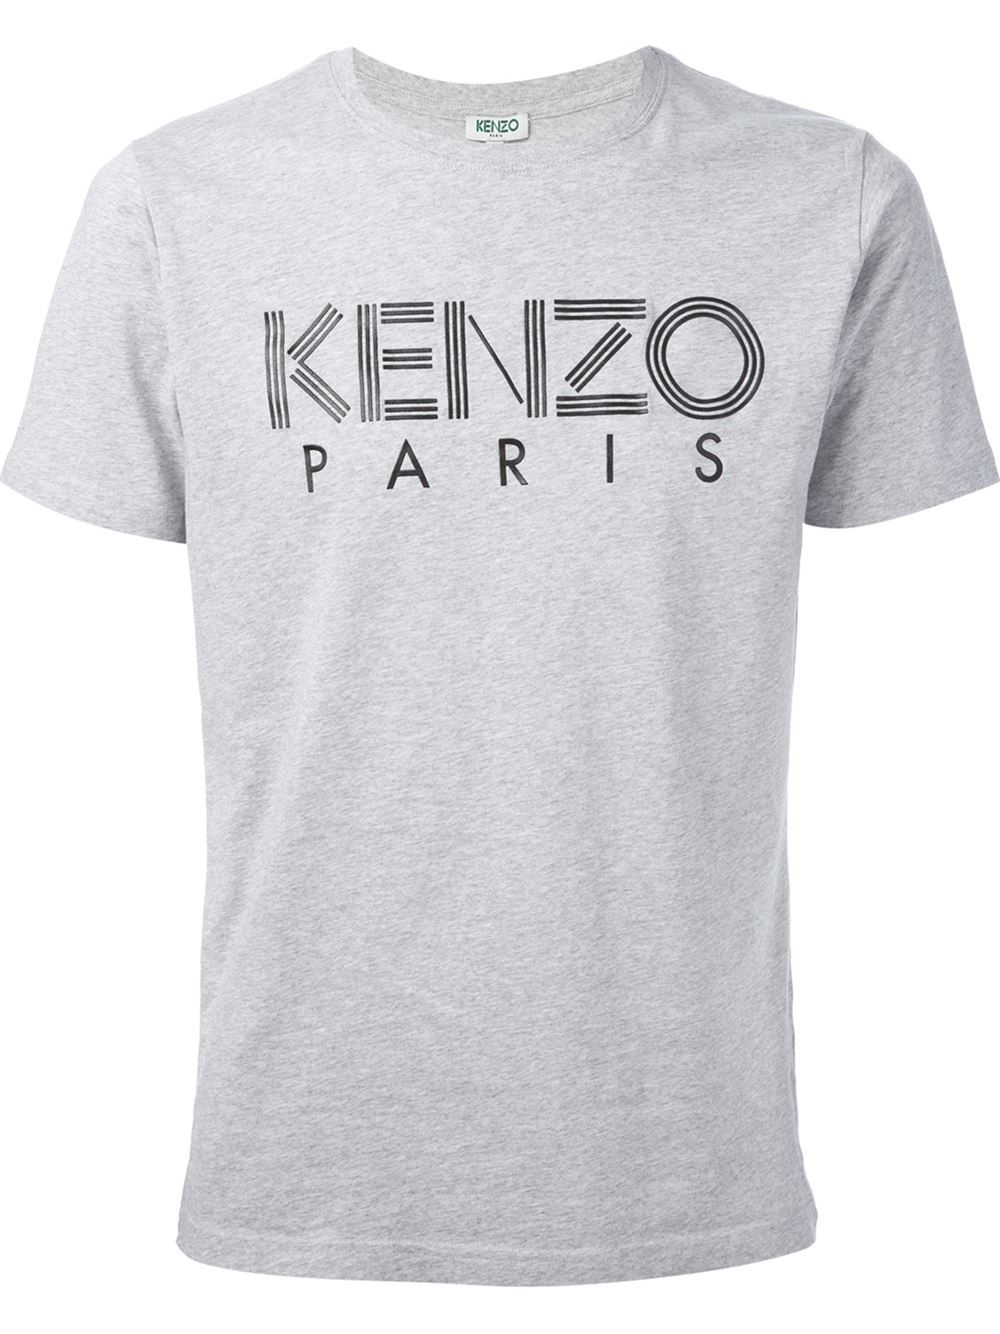 0b69713ee KENZO ' Paris' T-Shirt in Gray for Men - Lyst